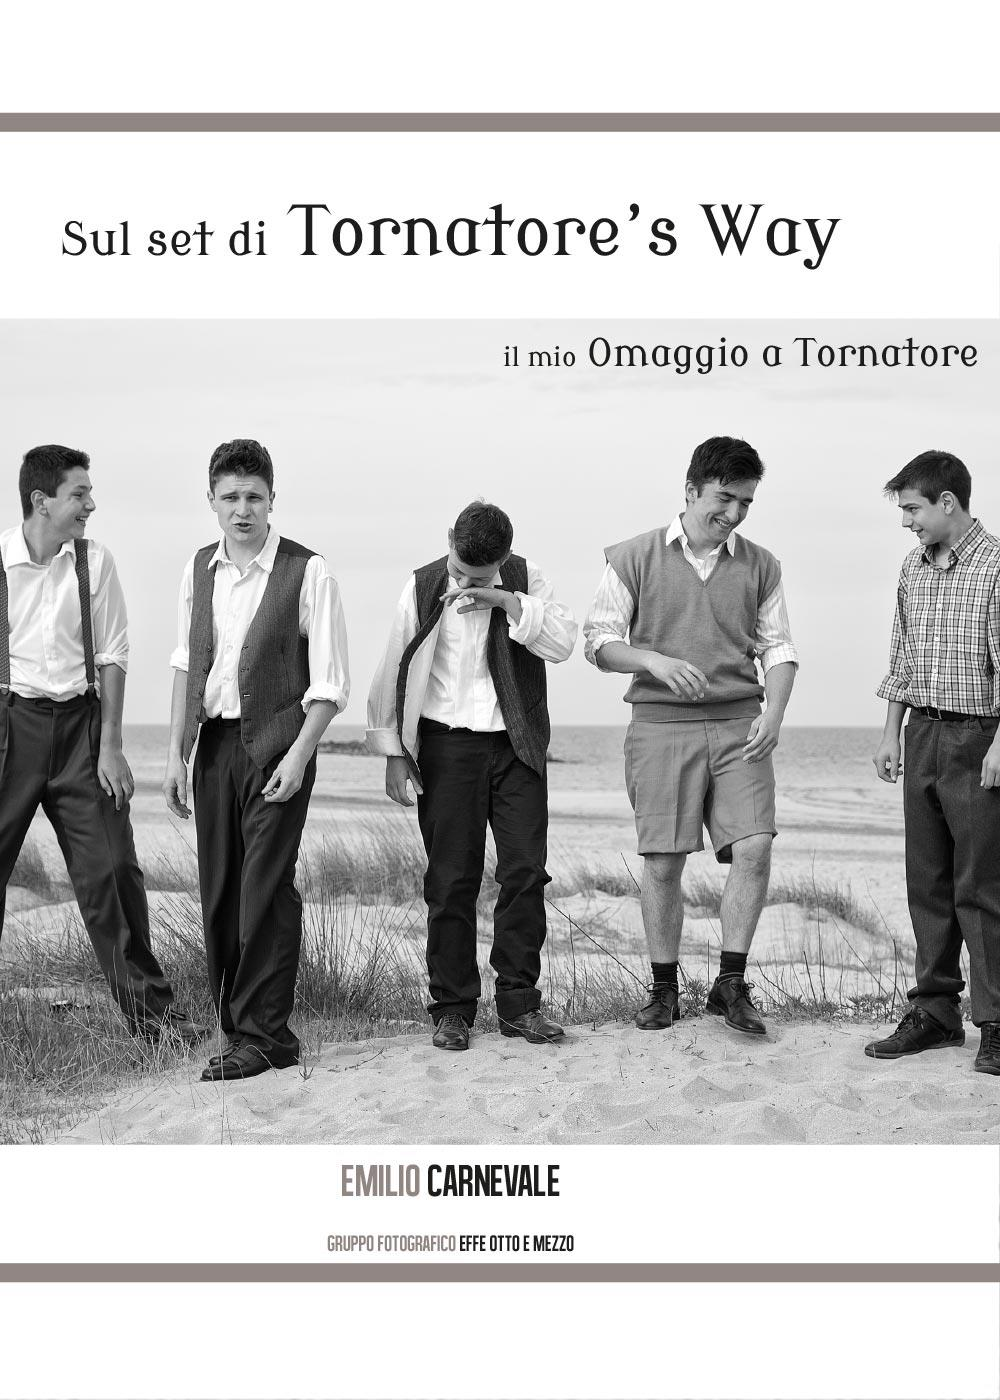 Sul set di Tornatore's Way